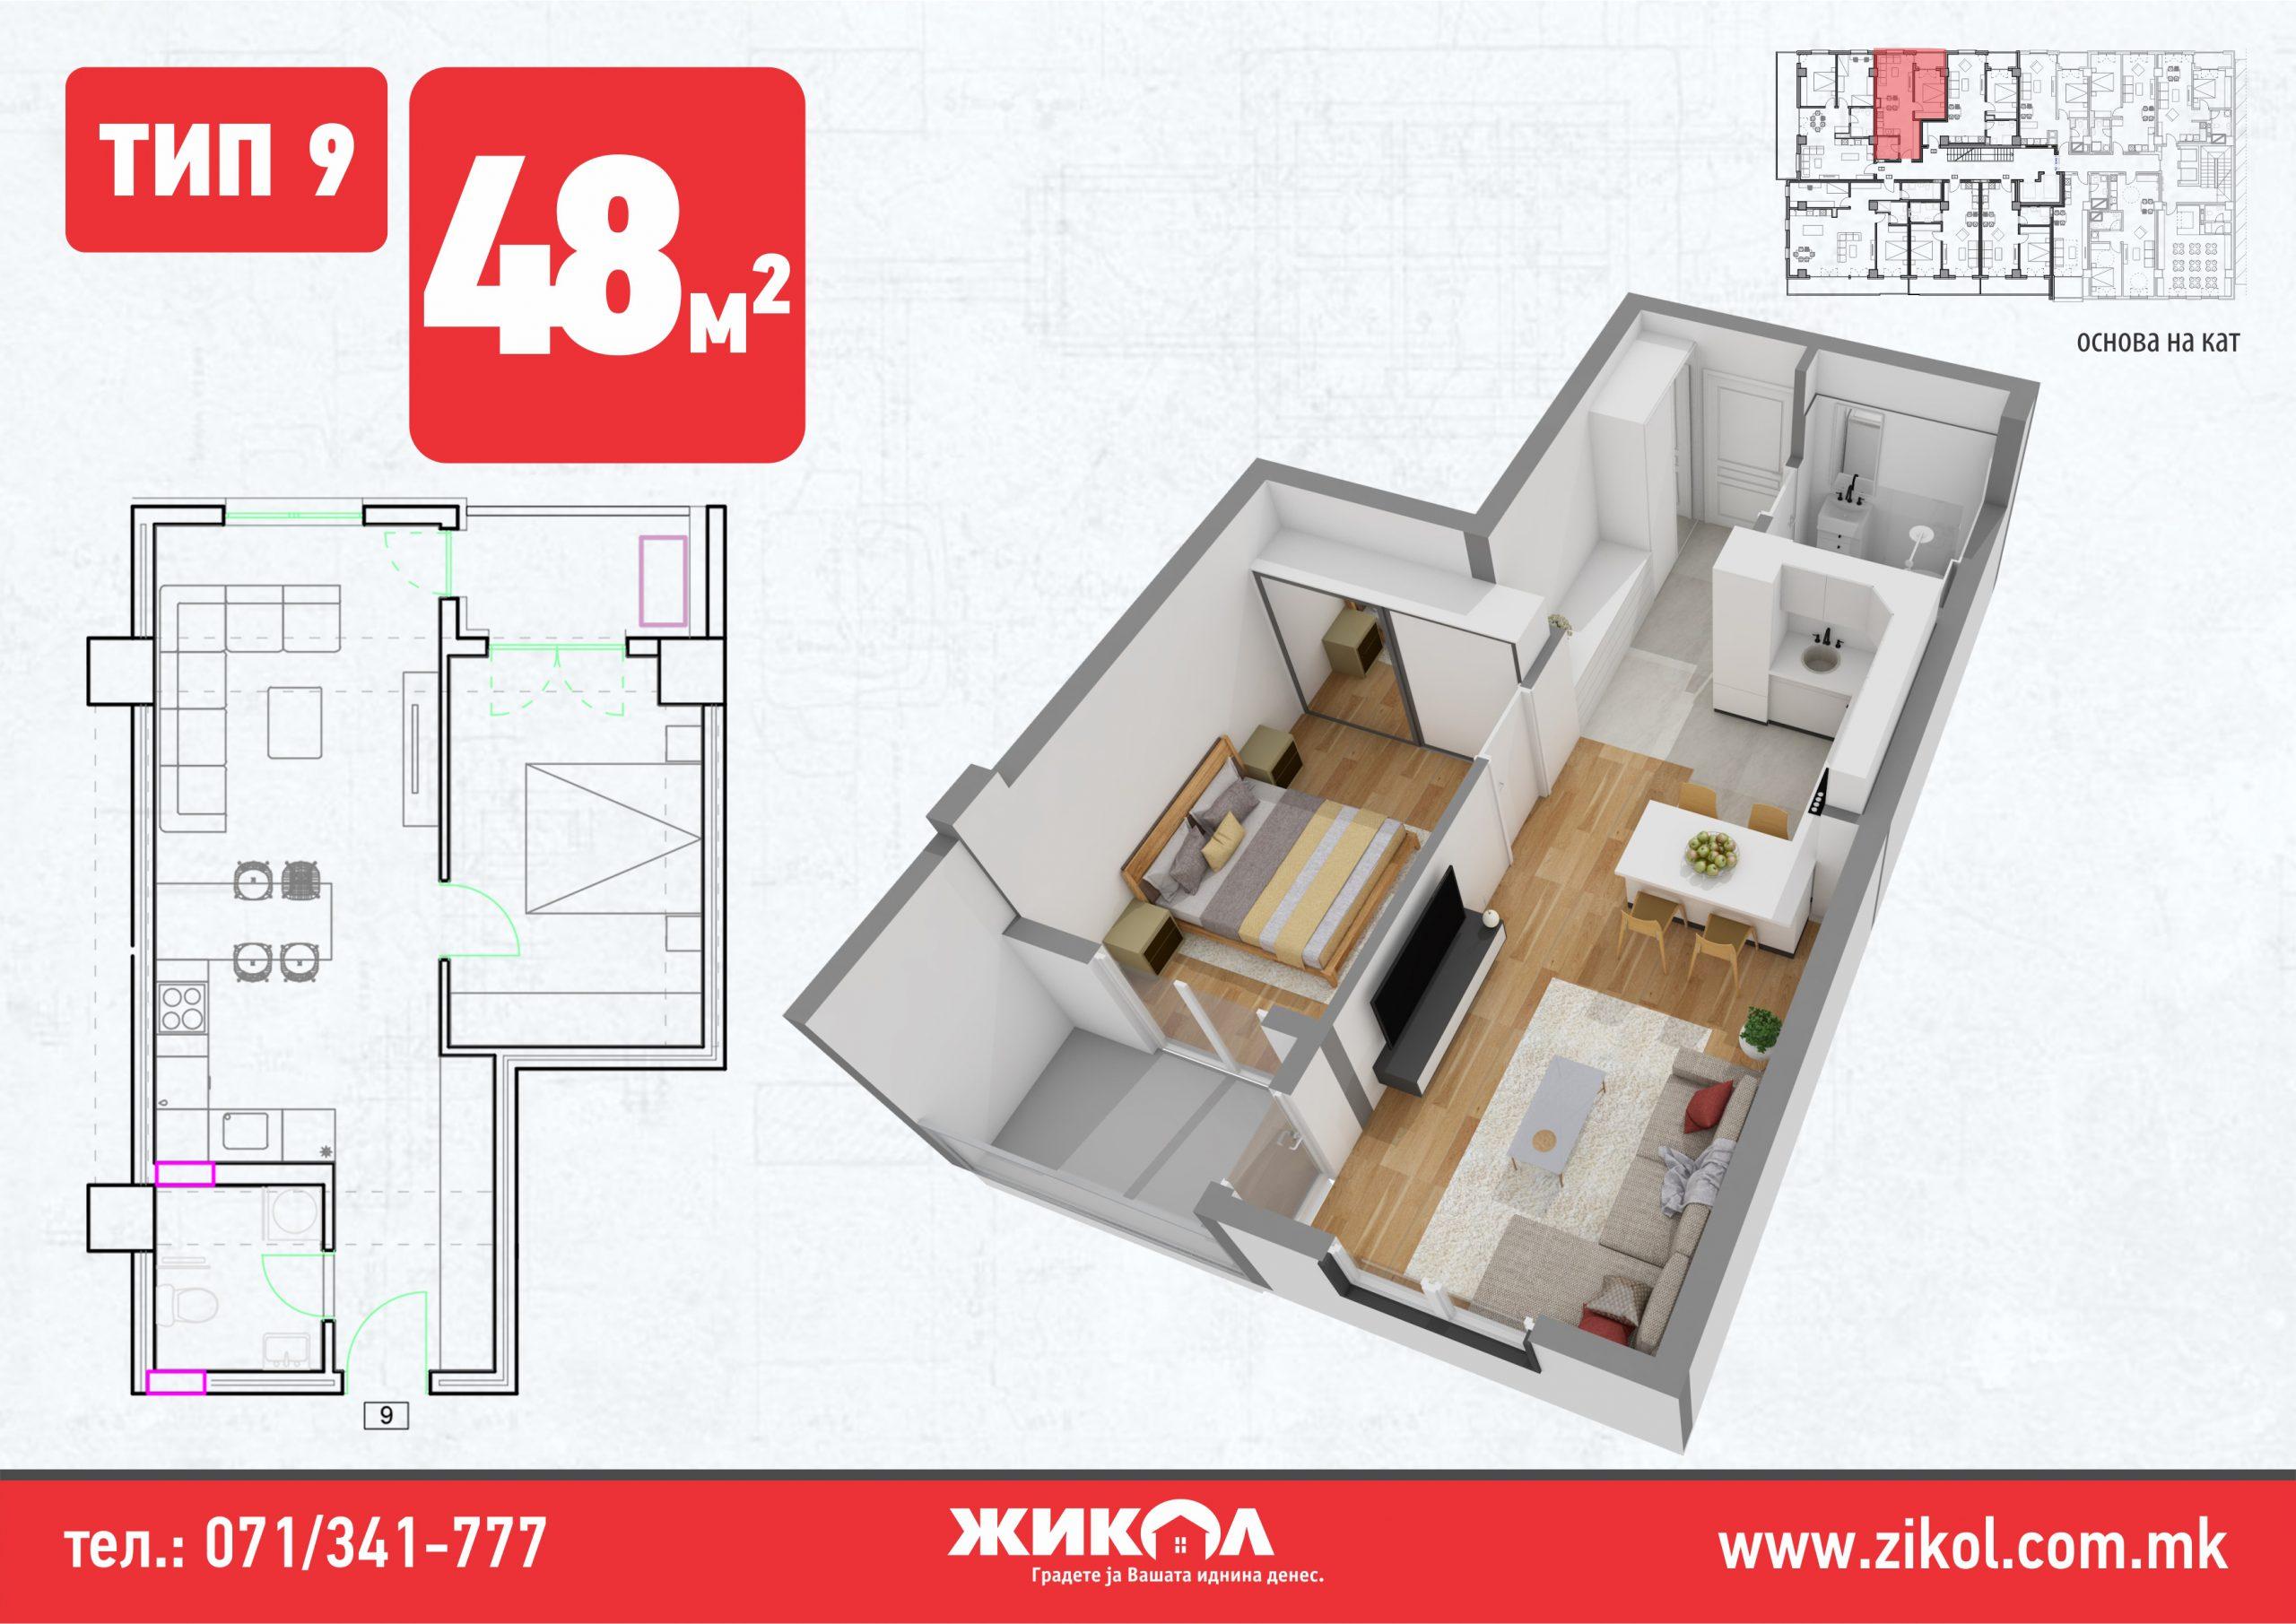 Зграда 55, кат 1, стан 9